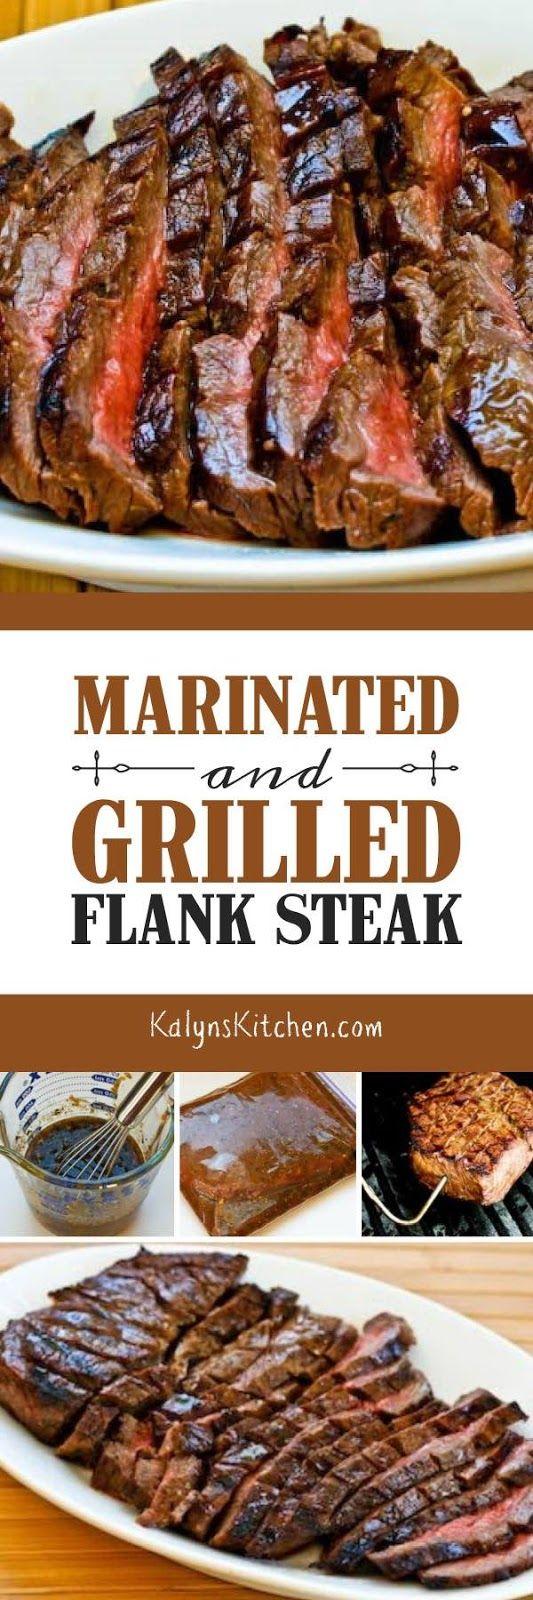 Marinated and Grilled Flank Steak Recipe found on KalynsKitchen.com